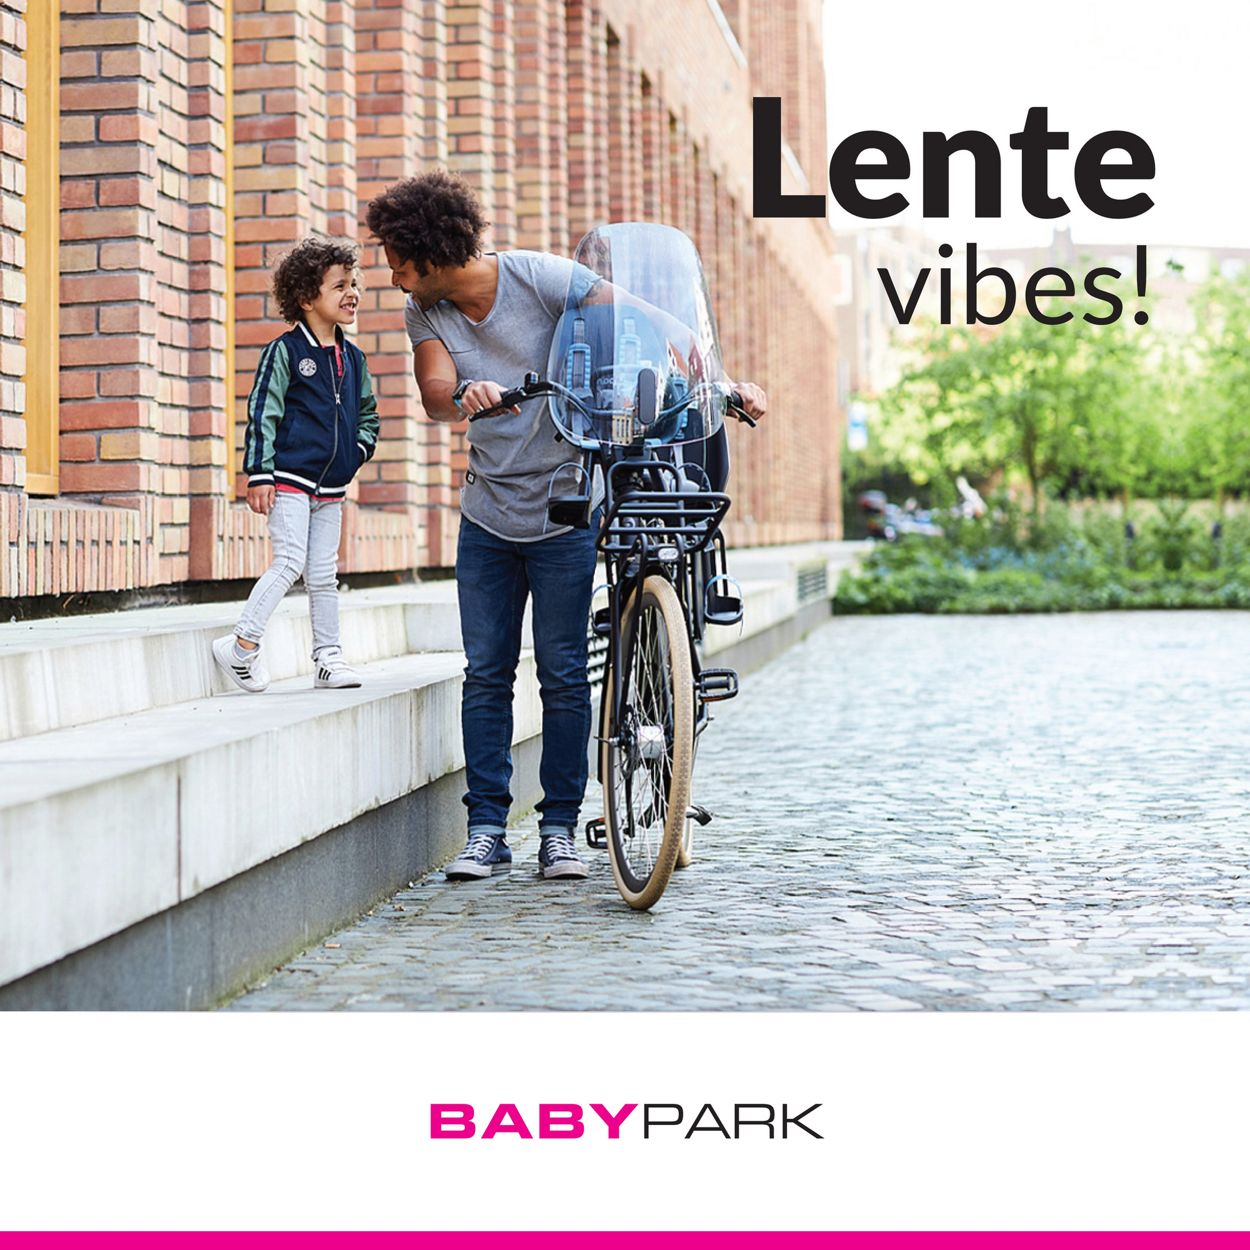 Catalogus van Babypark van 13.04.2021